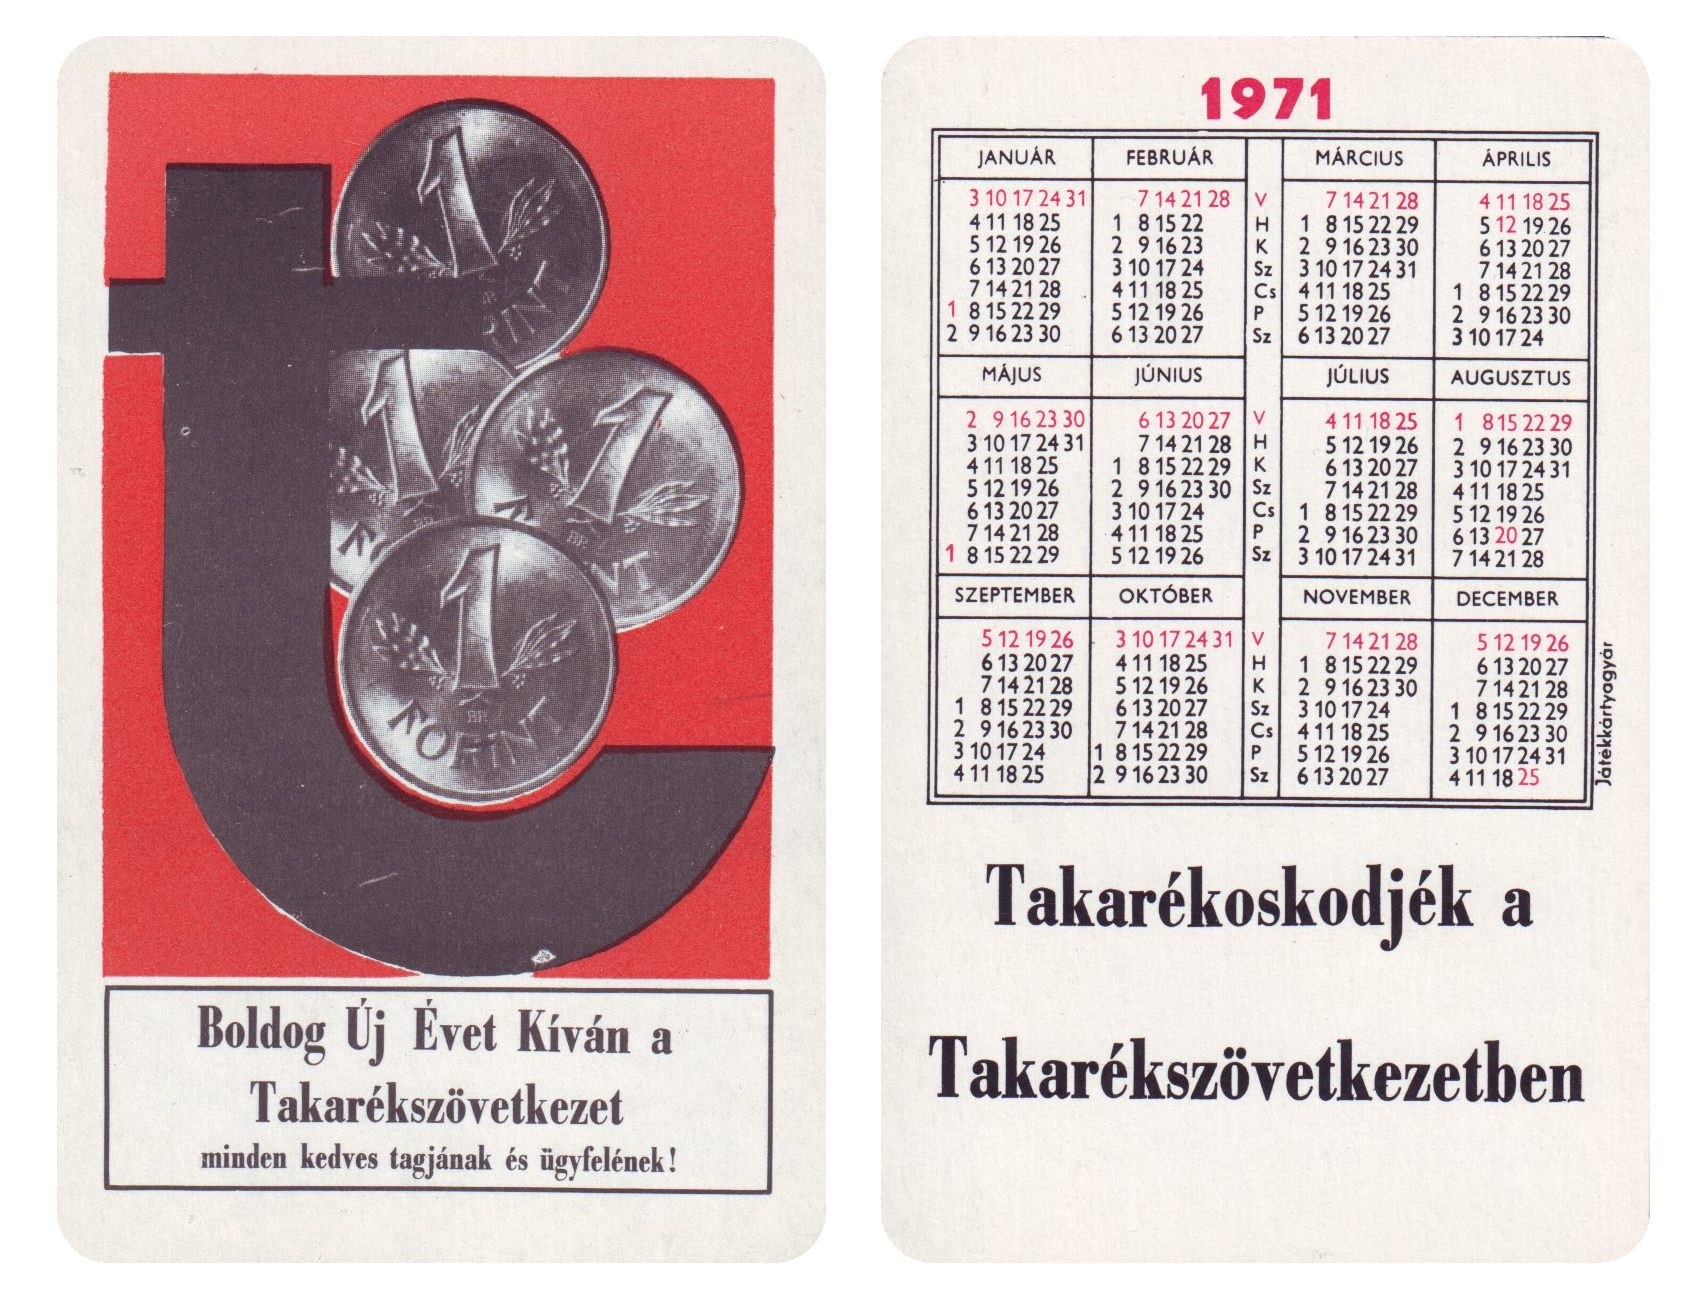 http://www.forintportal.hu/kartyanaptar/www_forintportal_hu_1971_kartyanaptar_026_nagy.jpg